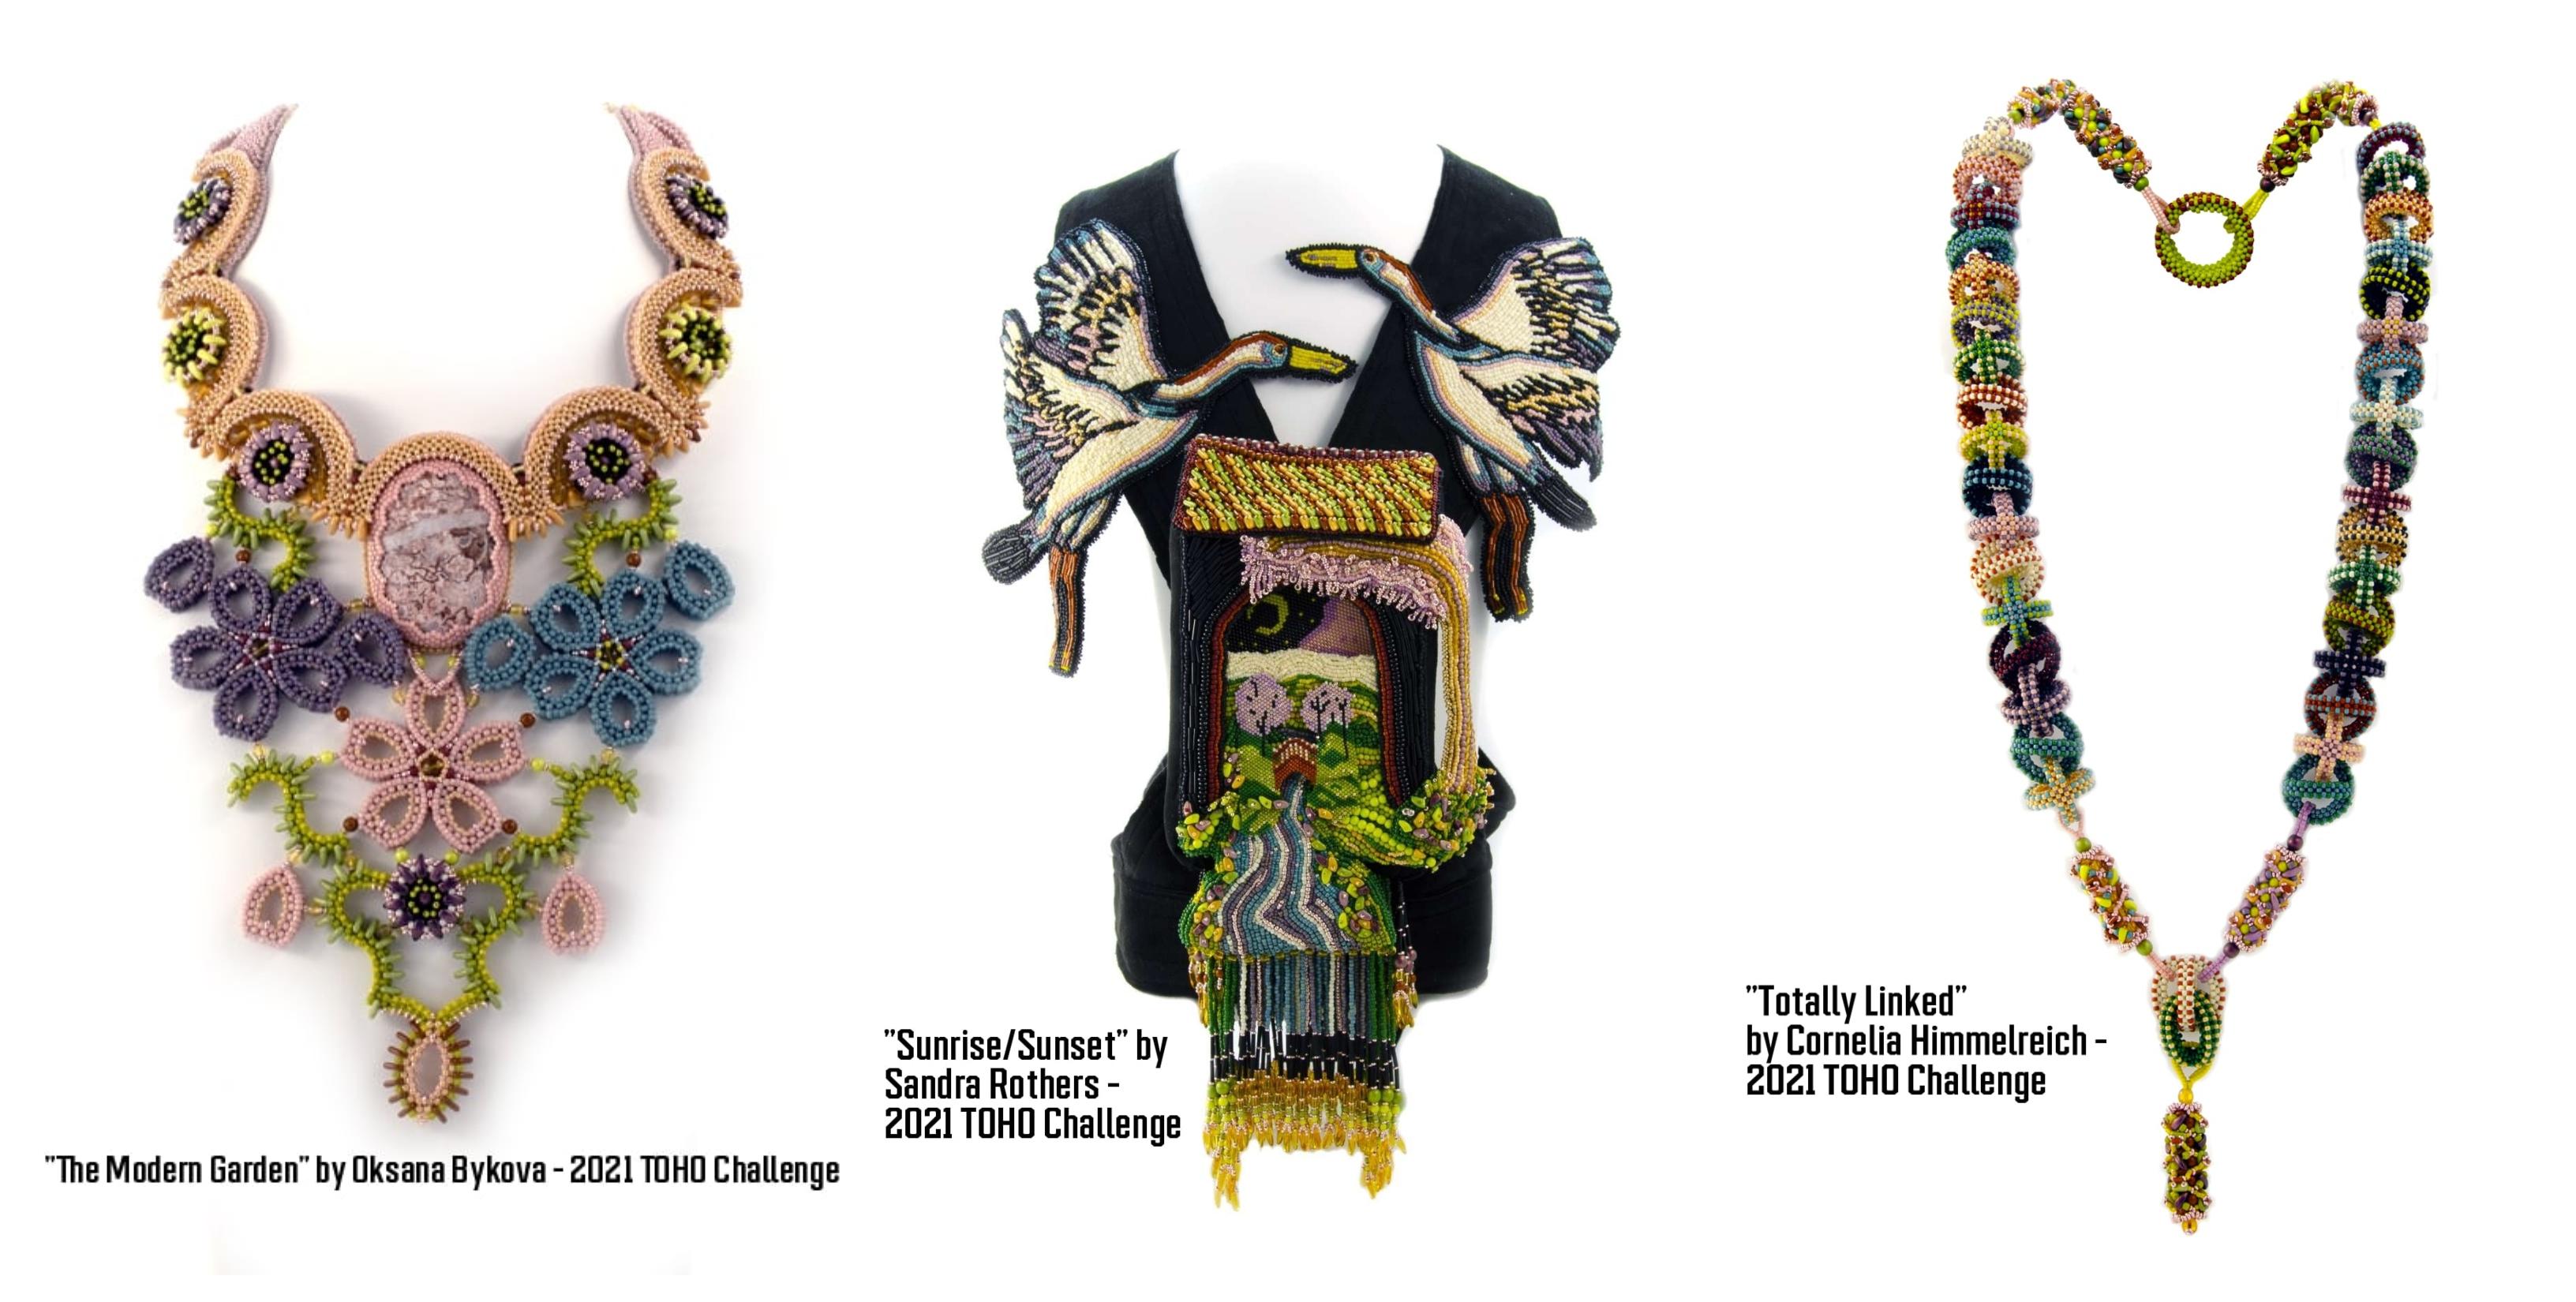 2021 TOHO Challenge Jewelry Designs